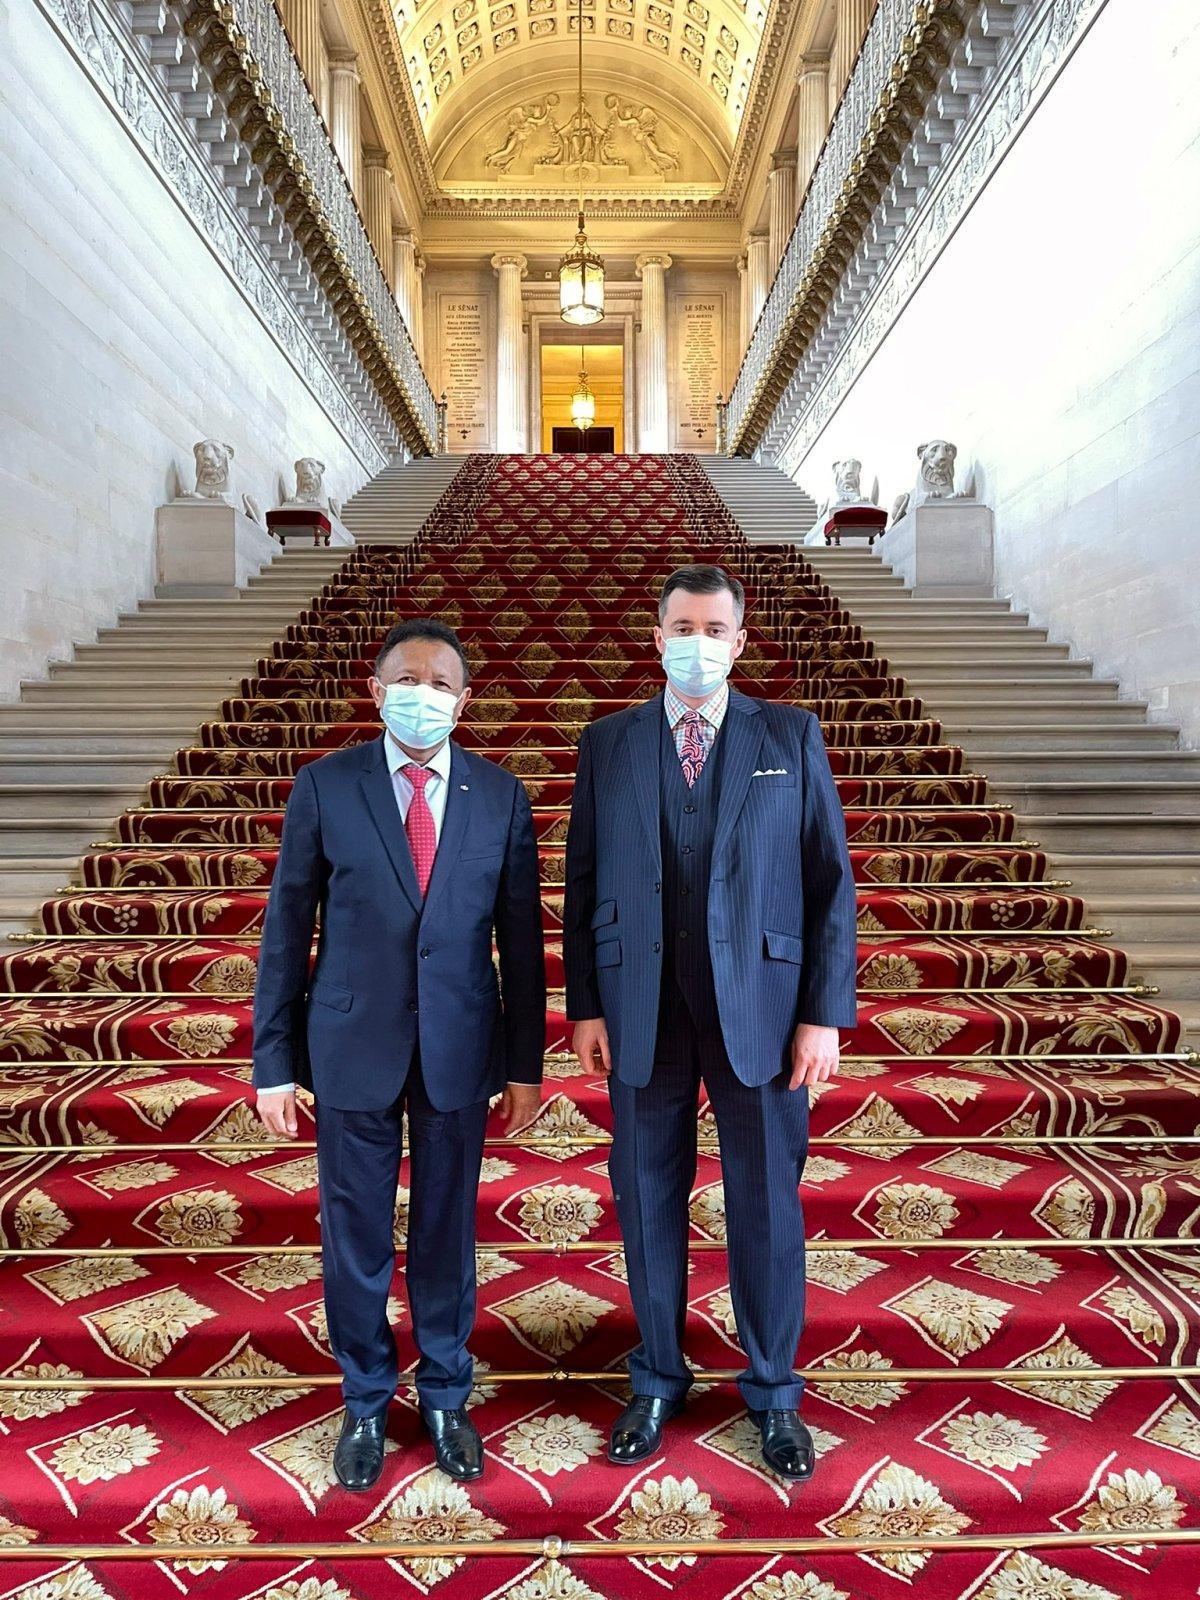 ExVZggyWUAMAP9H - France : l'ancien président de Madagascar, Hery Rajaonarimampianina reçu au Sénat